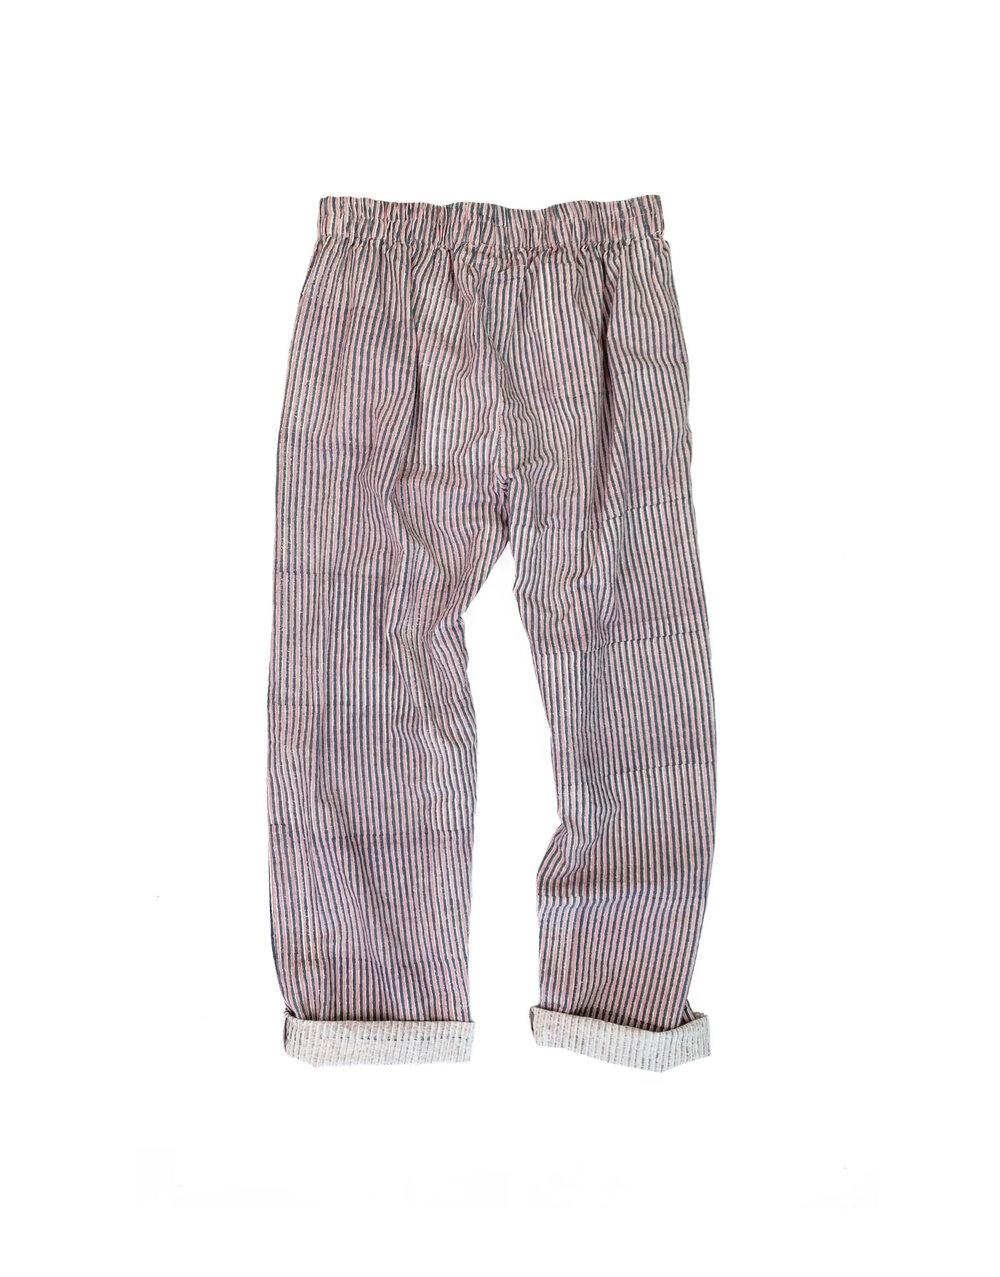 Lounger Pants in Blocked Stripe